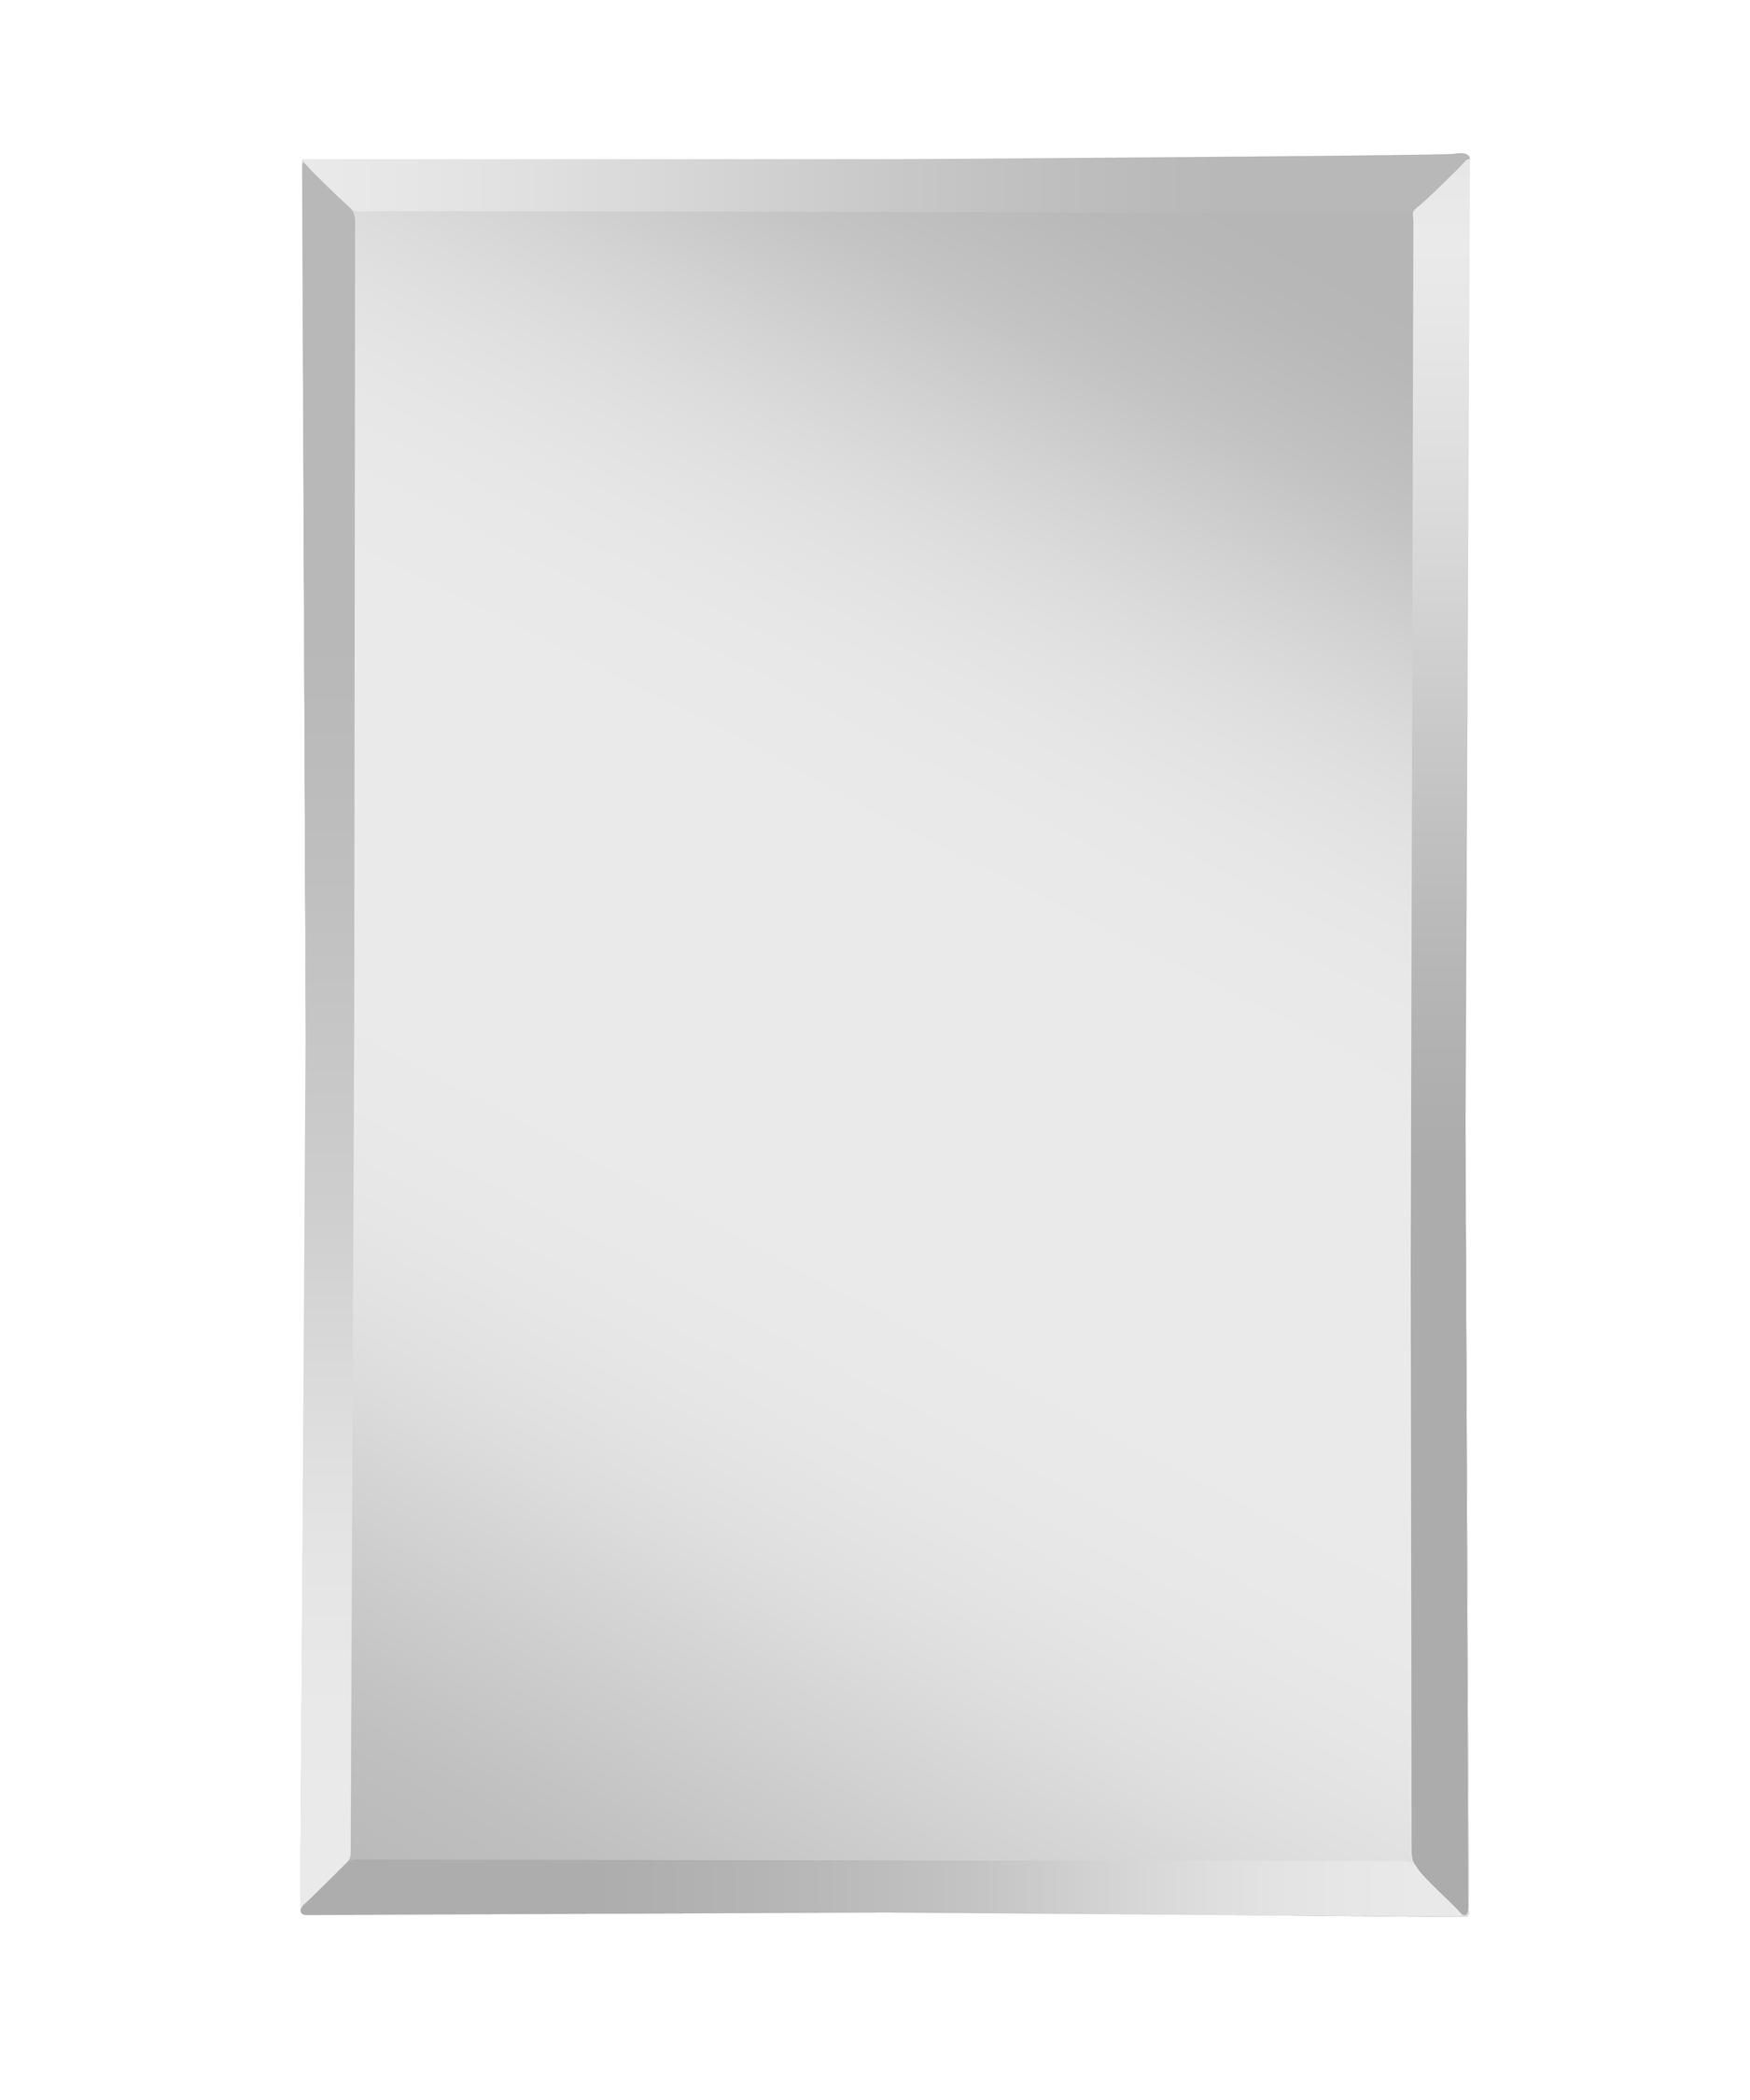 Feiss Infinity Wall Mirror | http://drrw.us | Pinterest | Mirror ...